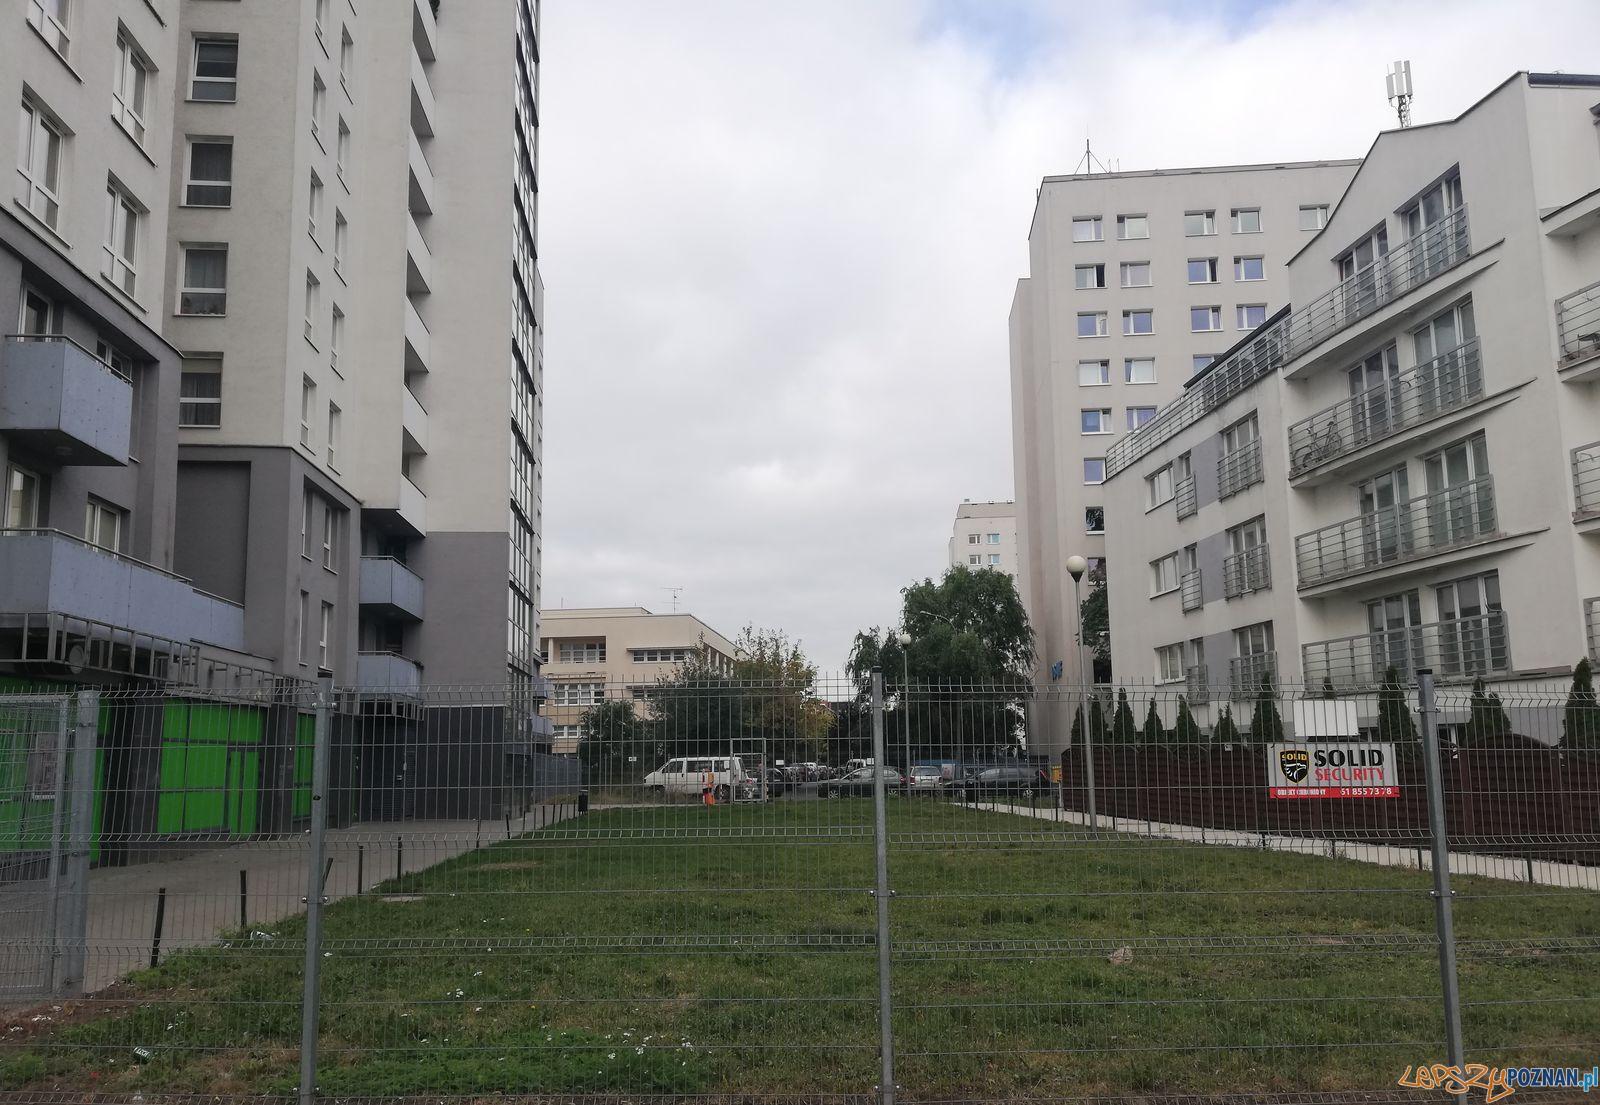 Bloki - mieszkania Poznań Rondo Rataje  Foto: